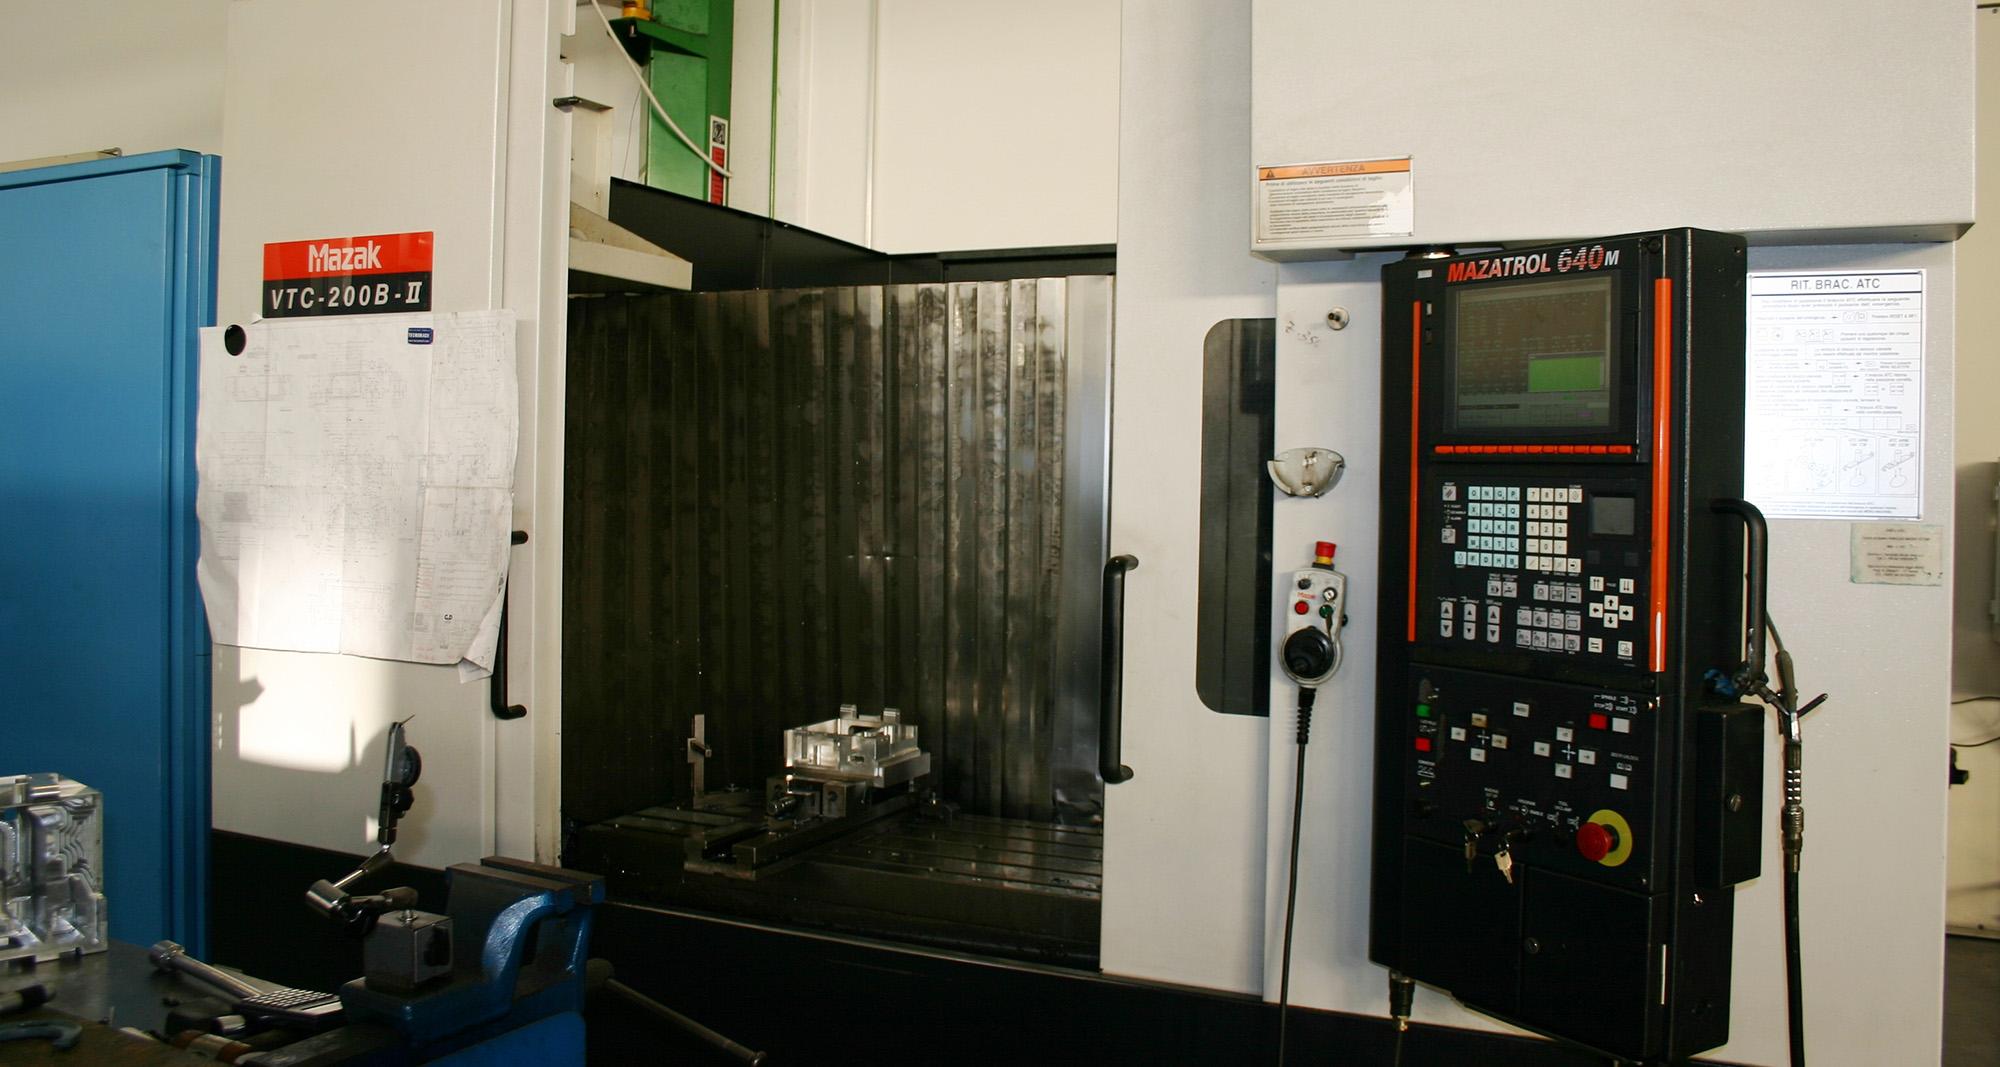 Mazak VTC 200B II - Remec